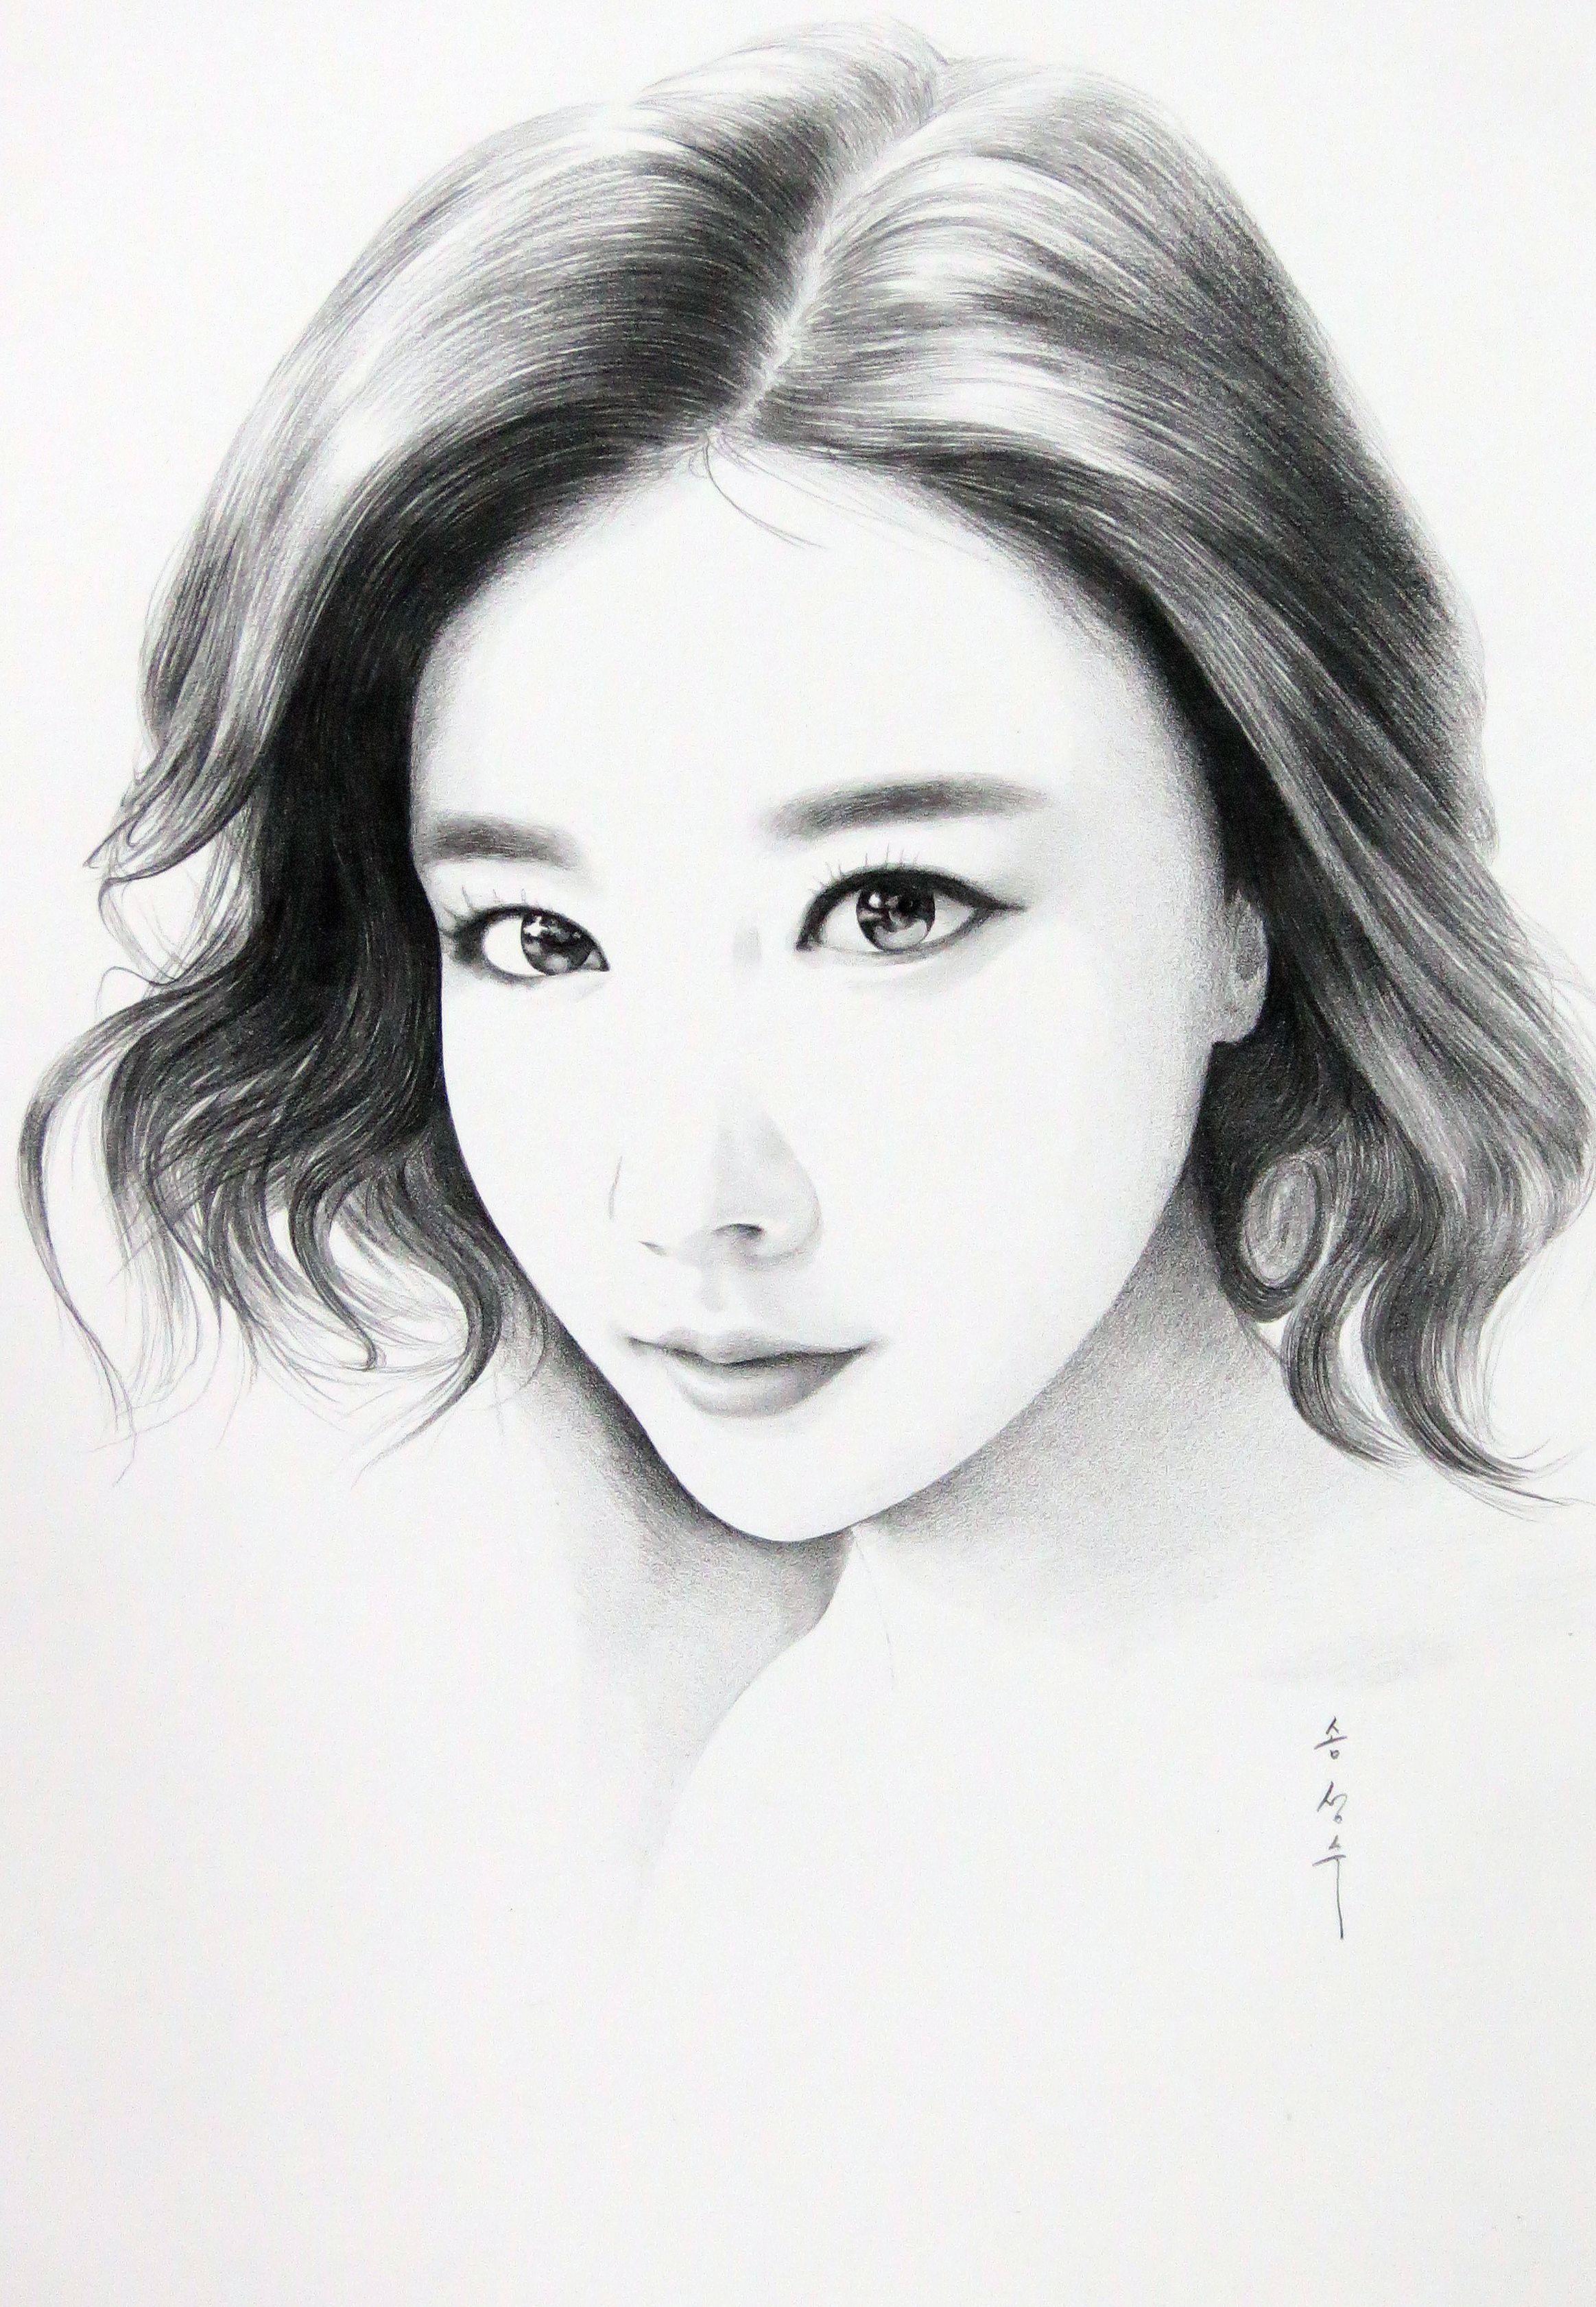 Картинки корейских девушек карандашом